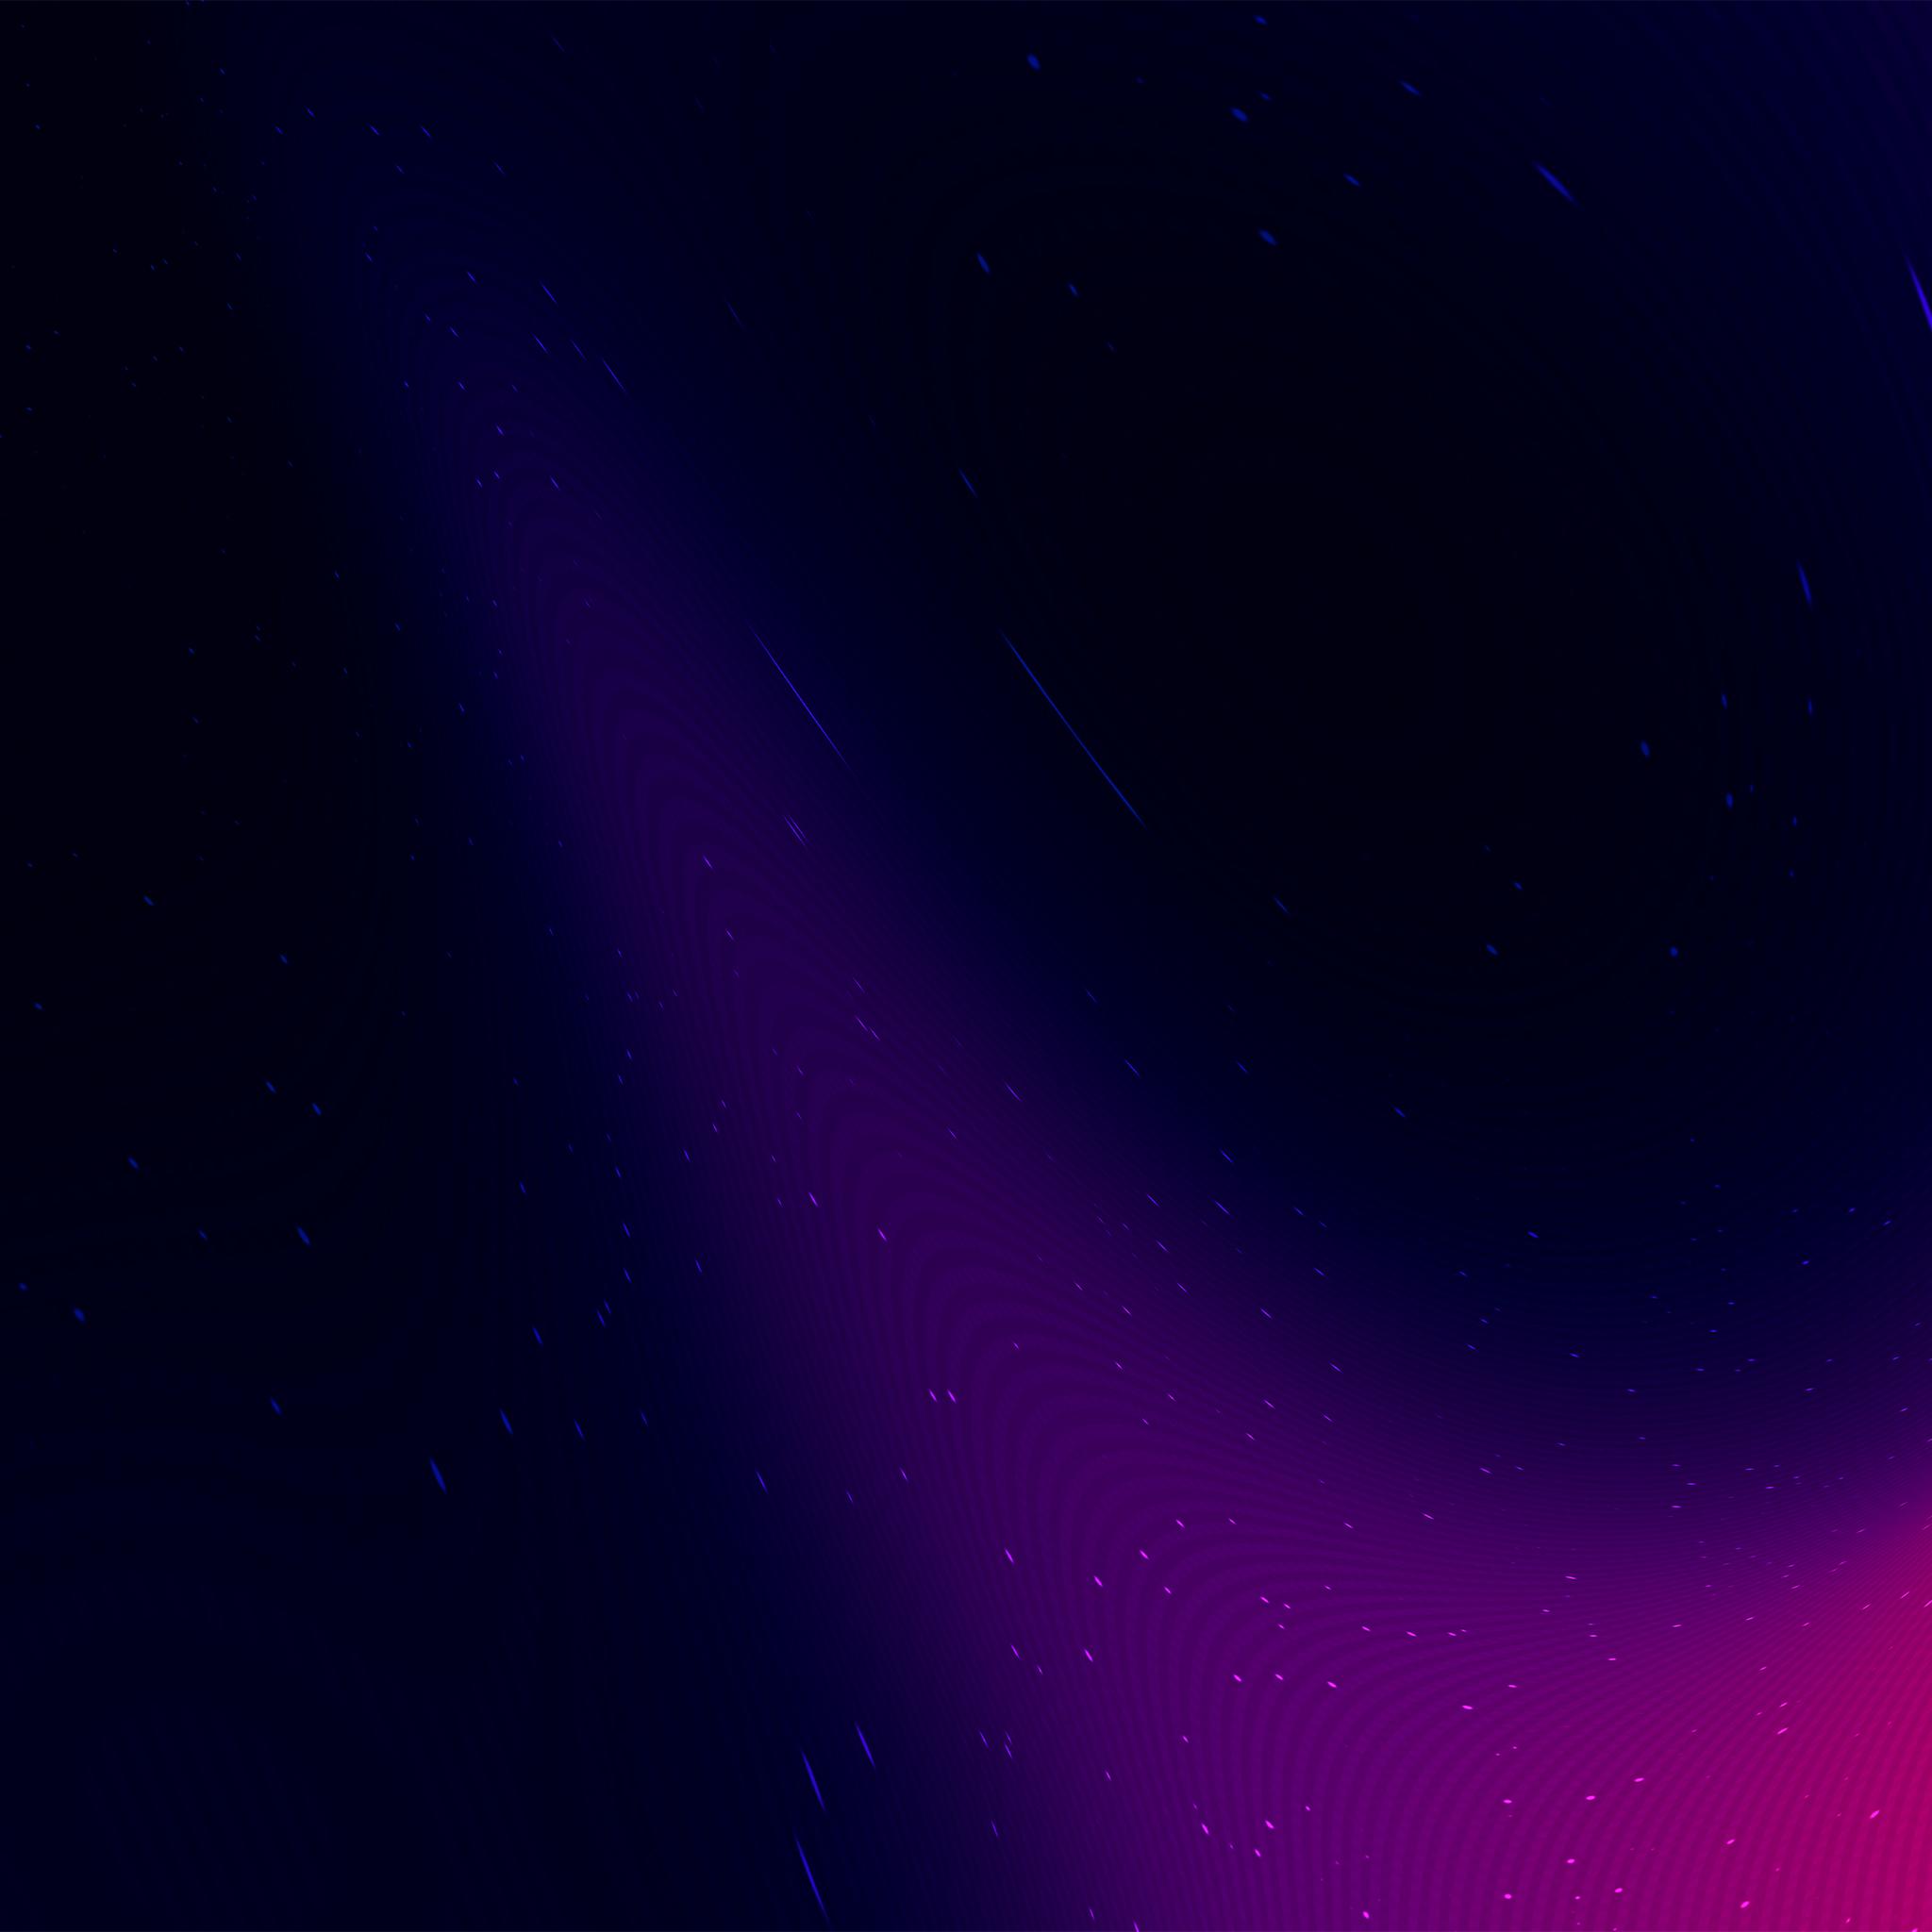 2048x2048 Abstract Purple Art 4k Ipad Air HD 4k Wallpapers